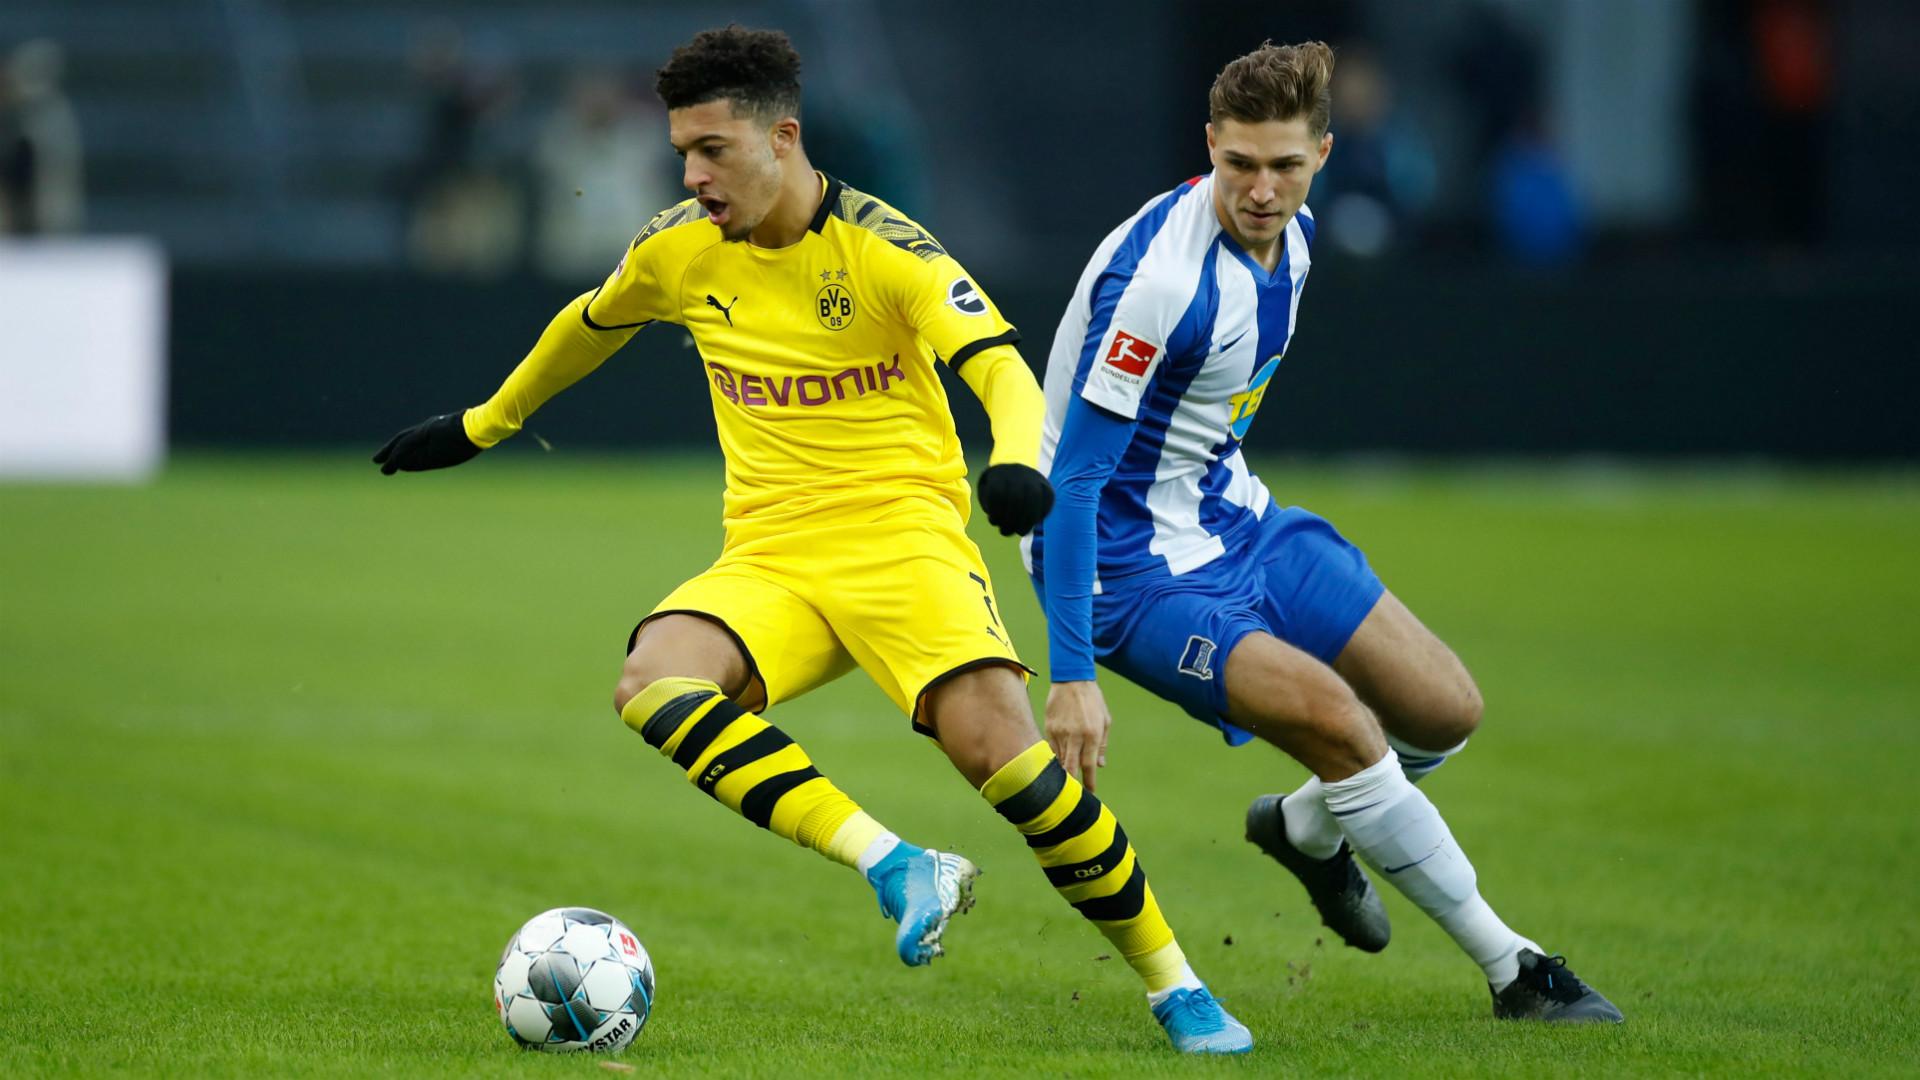 Hertha-Borussia (1-2), Dortmund renoue avec la victoire